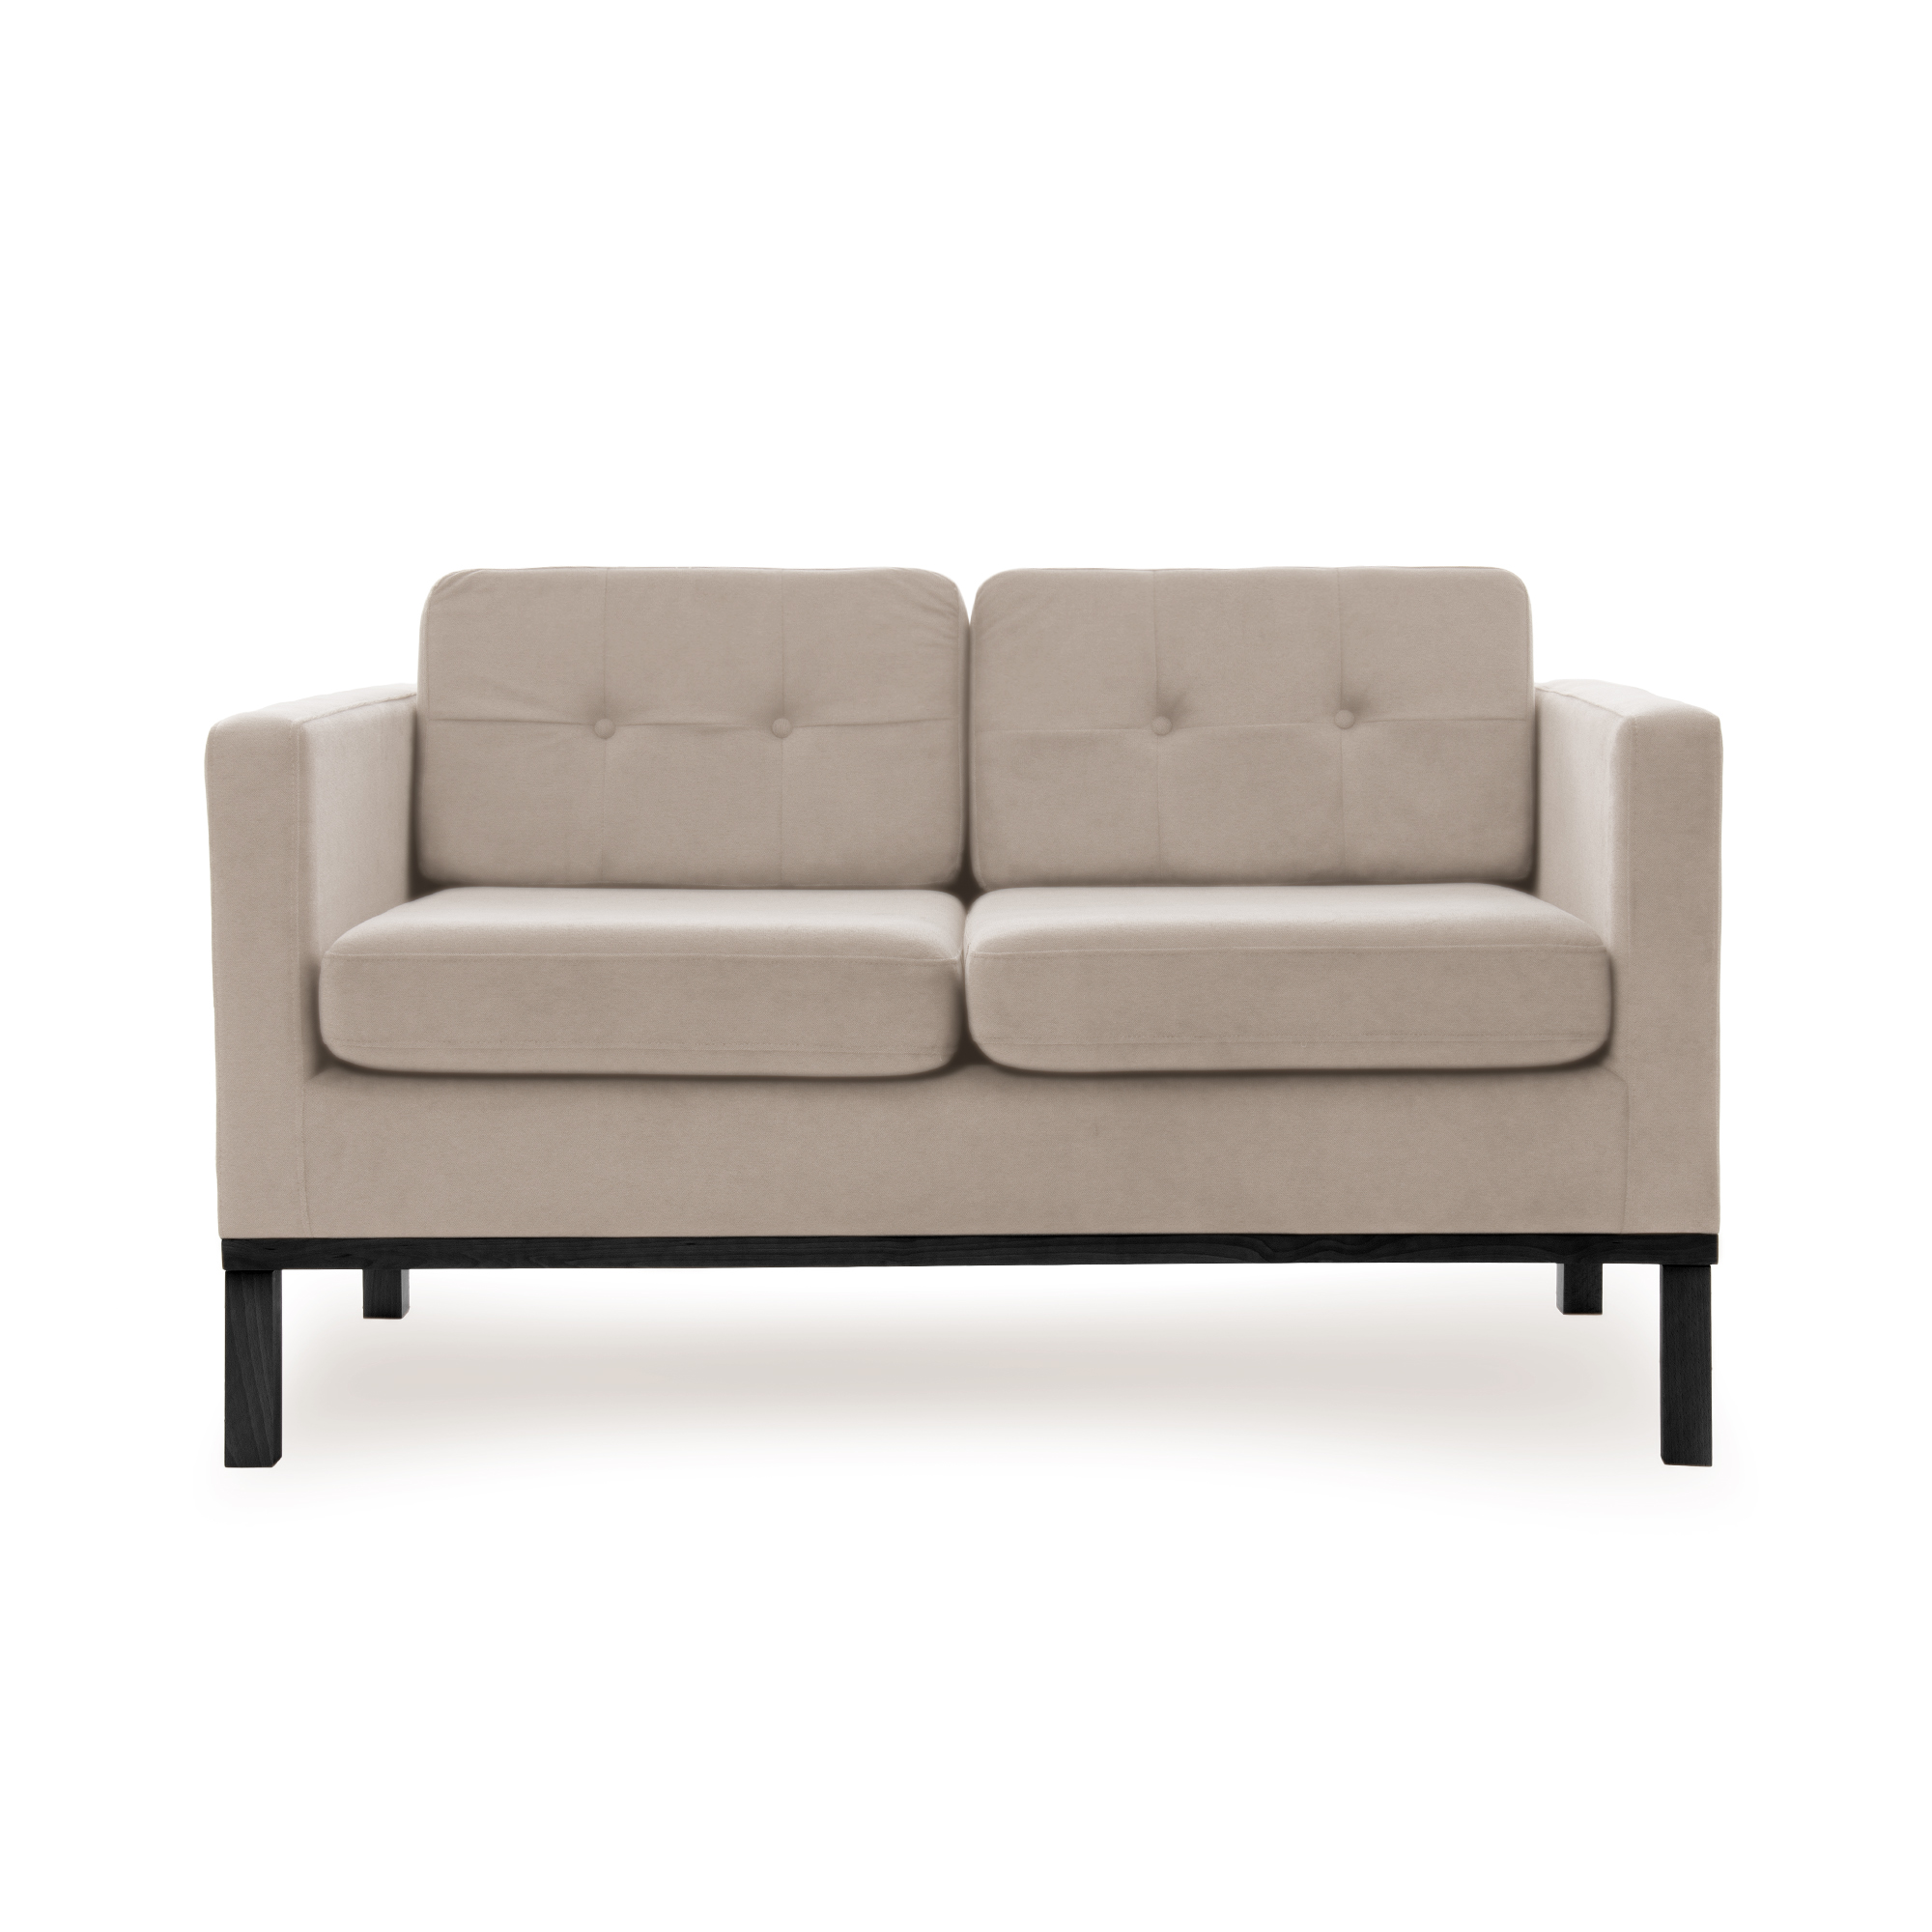 Canapea Fixa 2 locuri Jonan Beige/Black